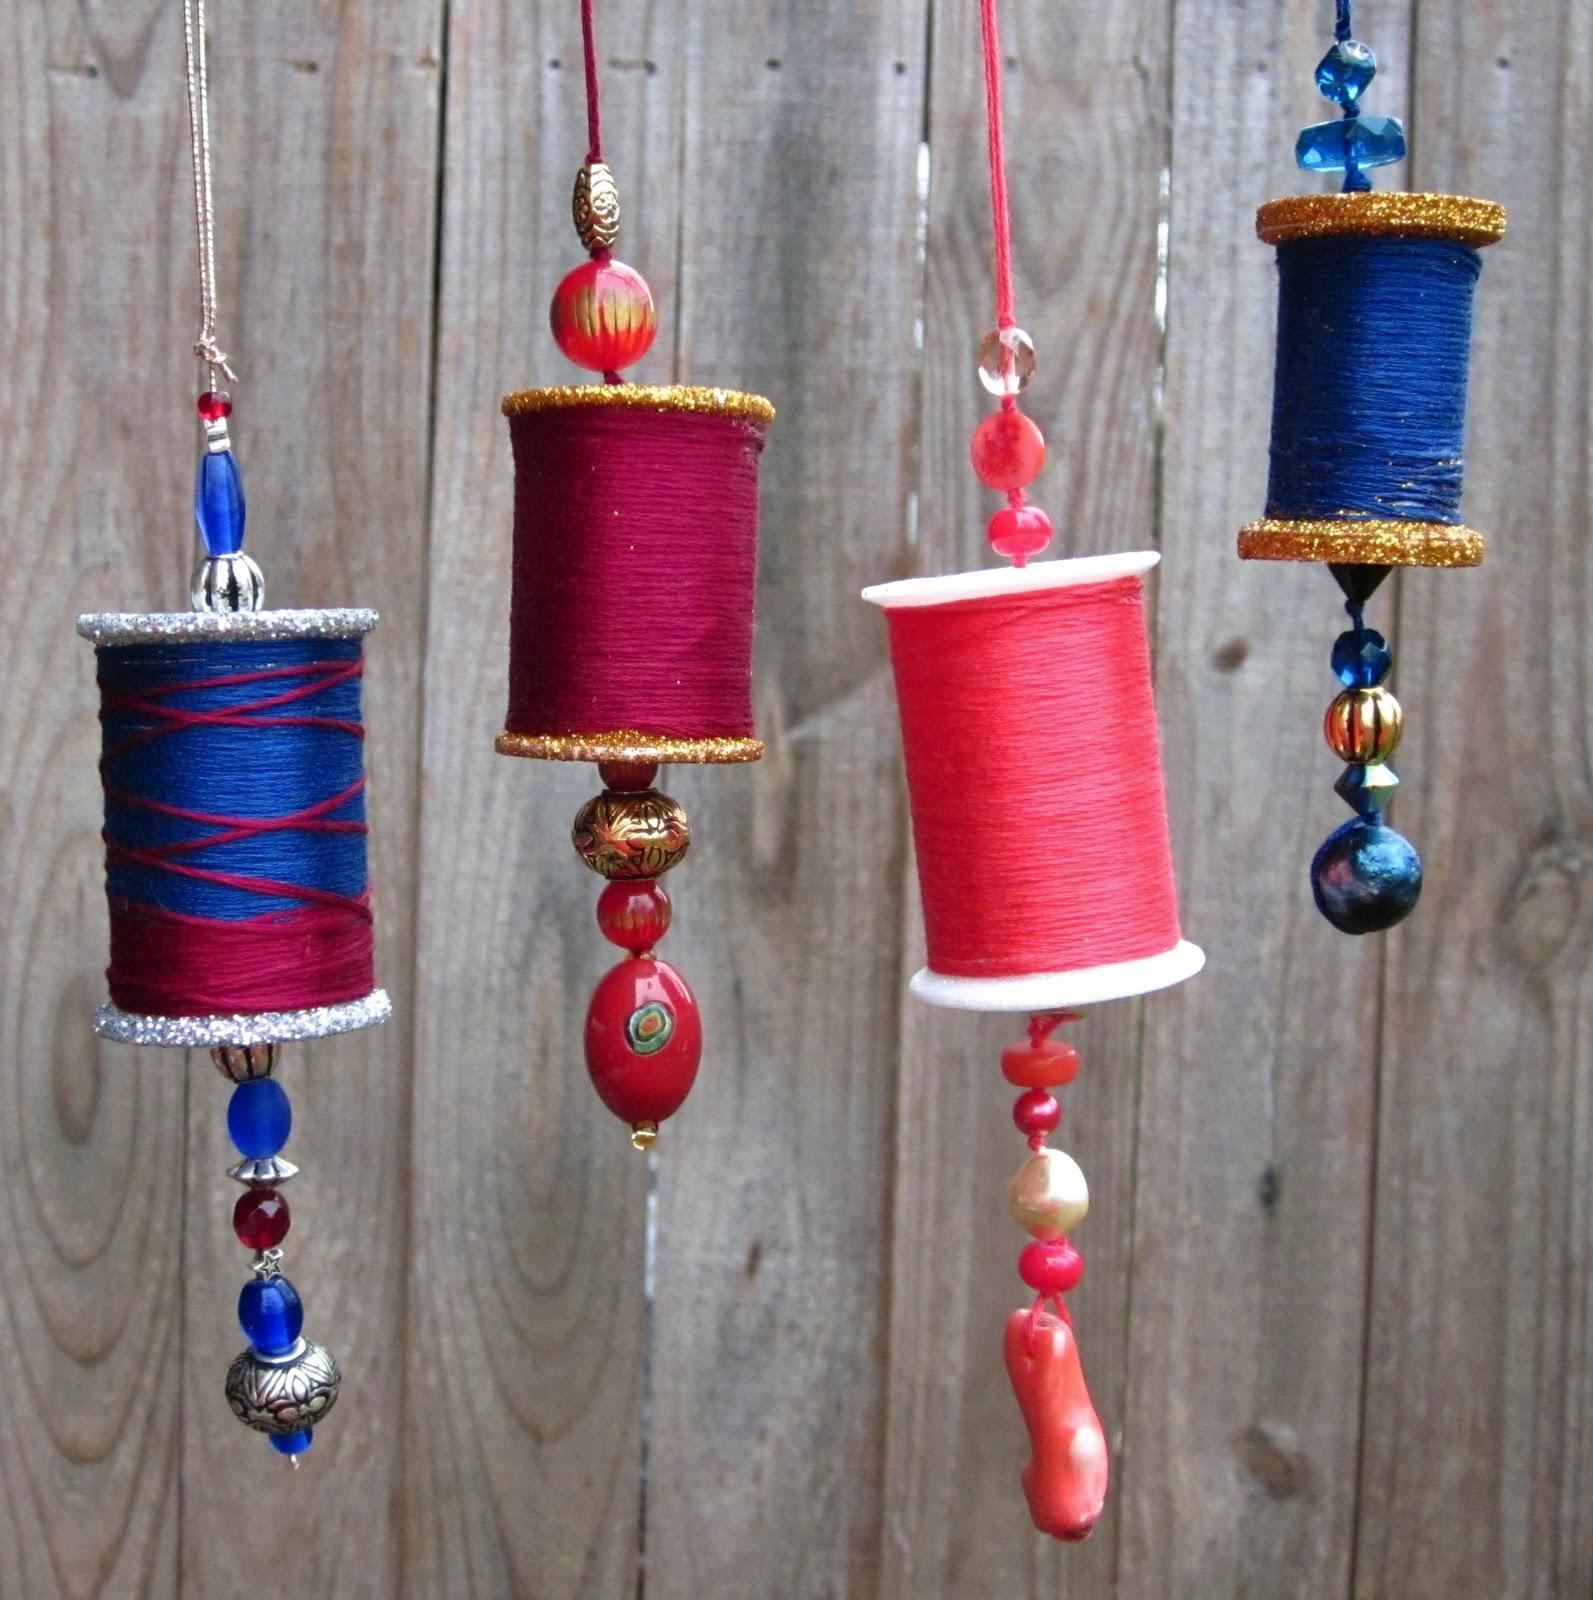 diy recycled bobbin christmas ornaments - Recycled Christmas Ornaments